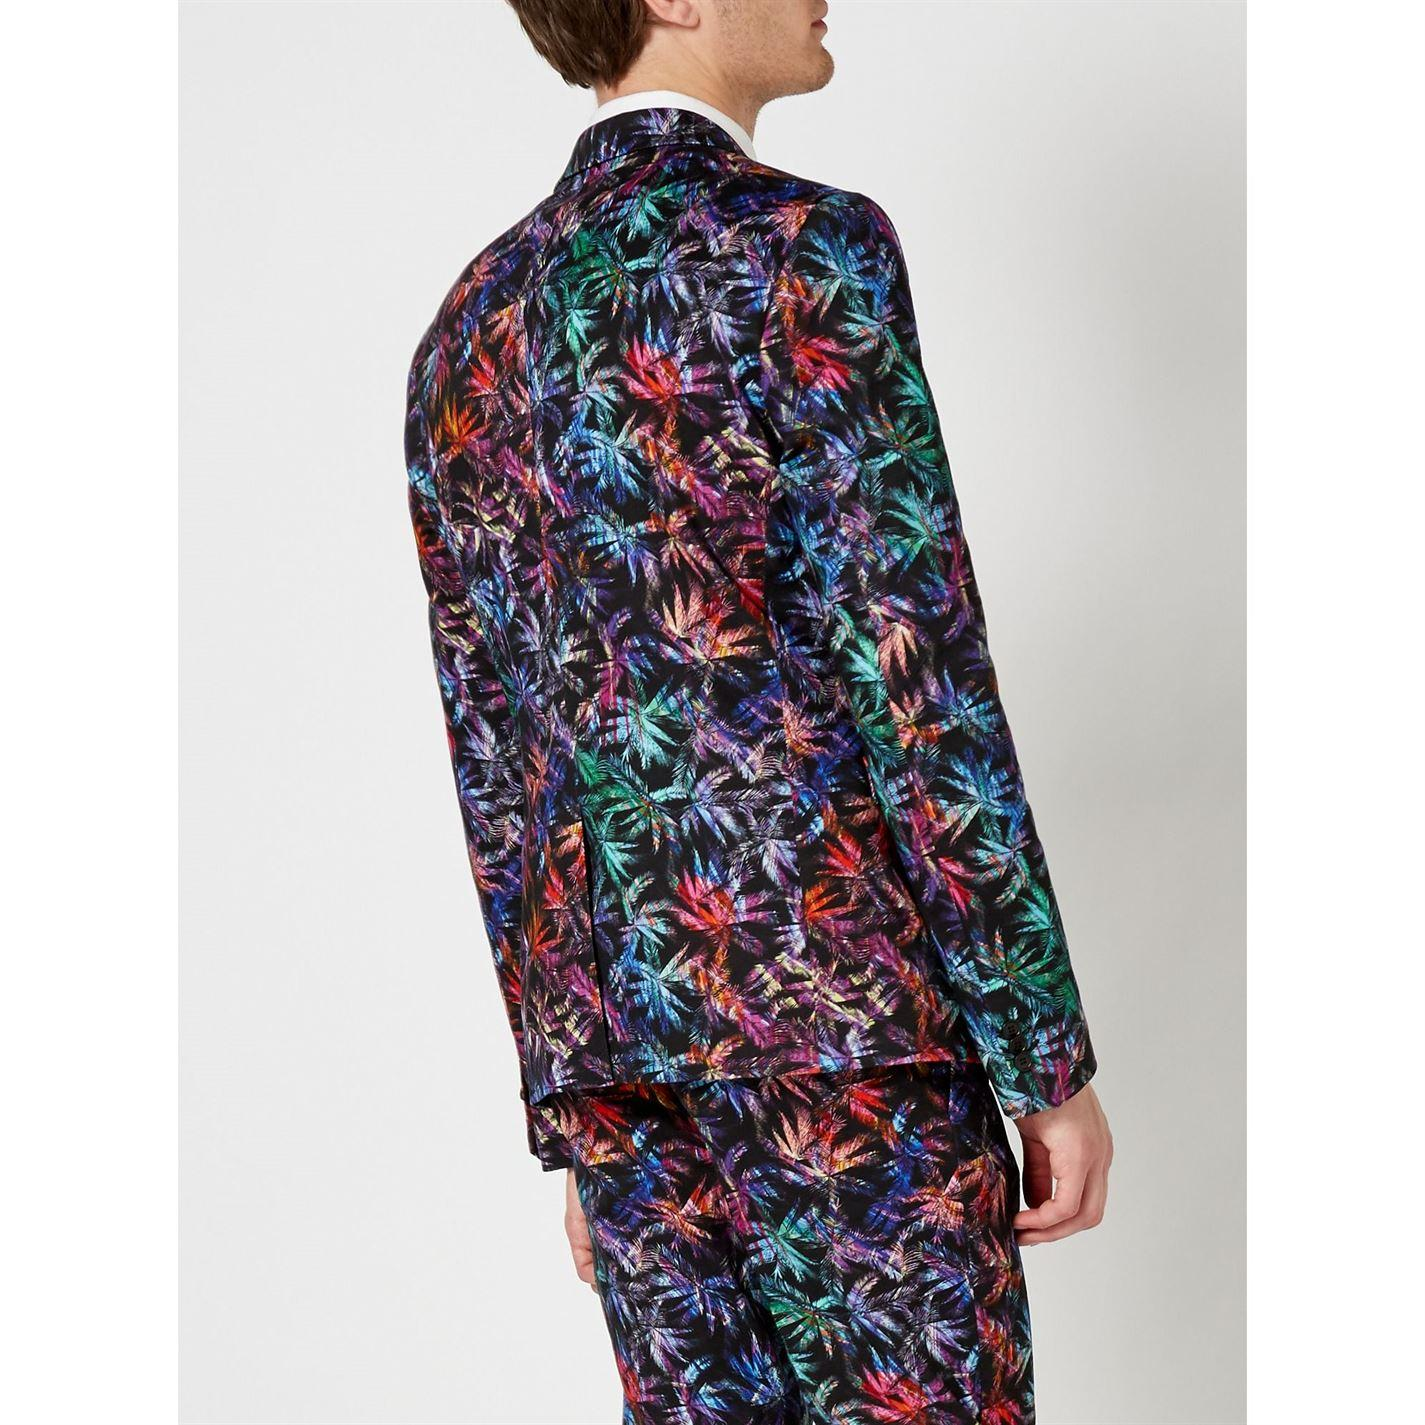 Label Lab Cotton Leonardo Palm Printed Skinny Fit Suit Jacket in Black for Men